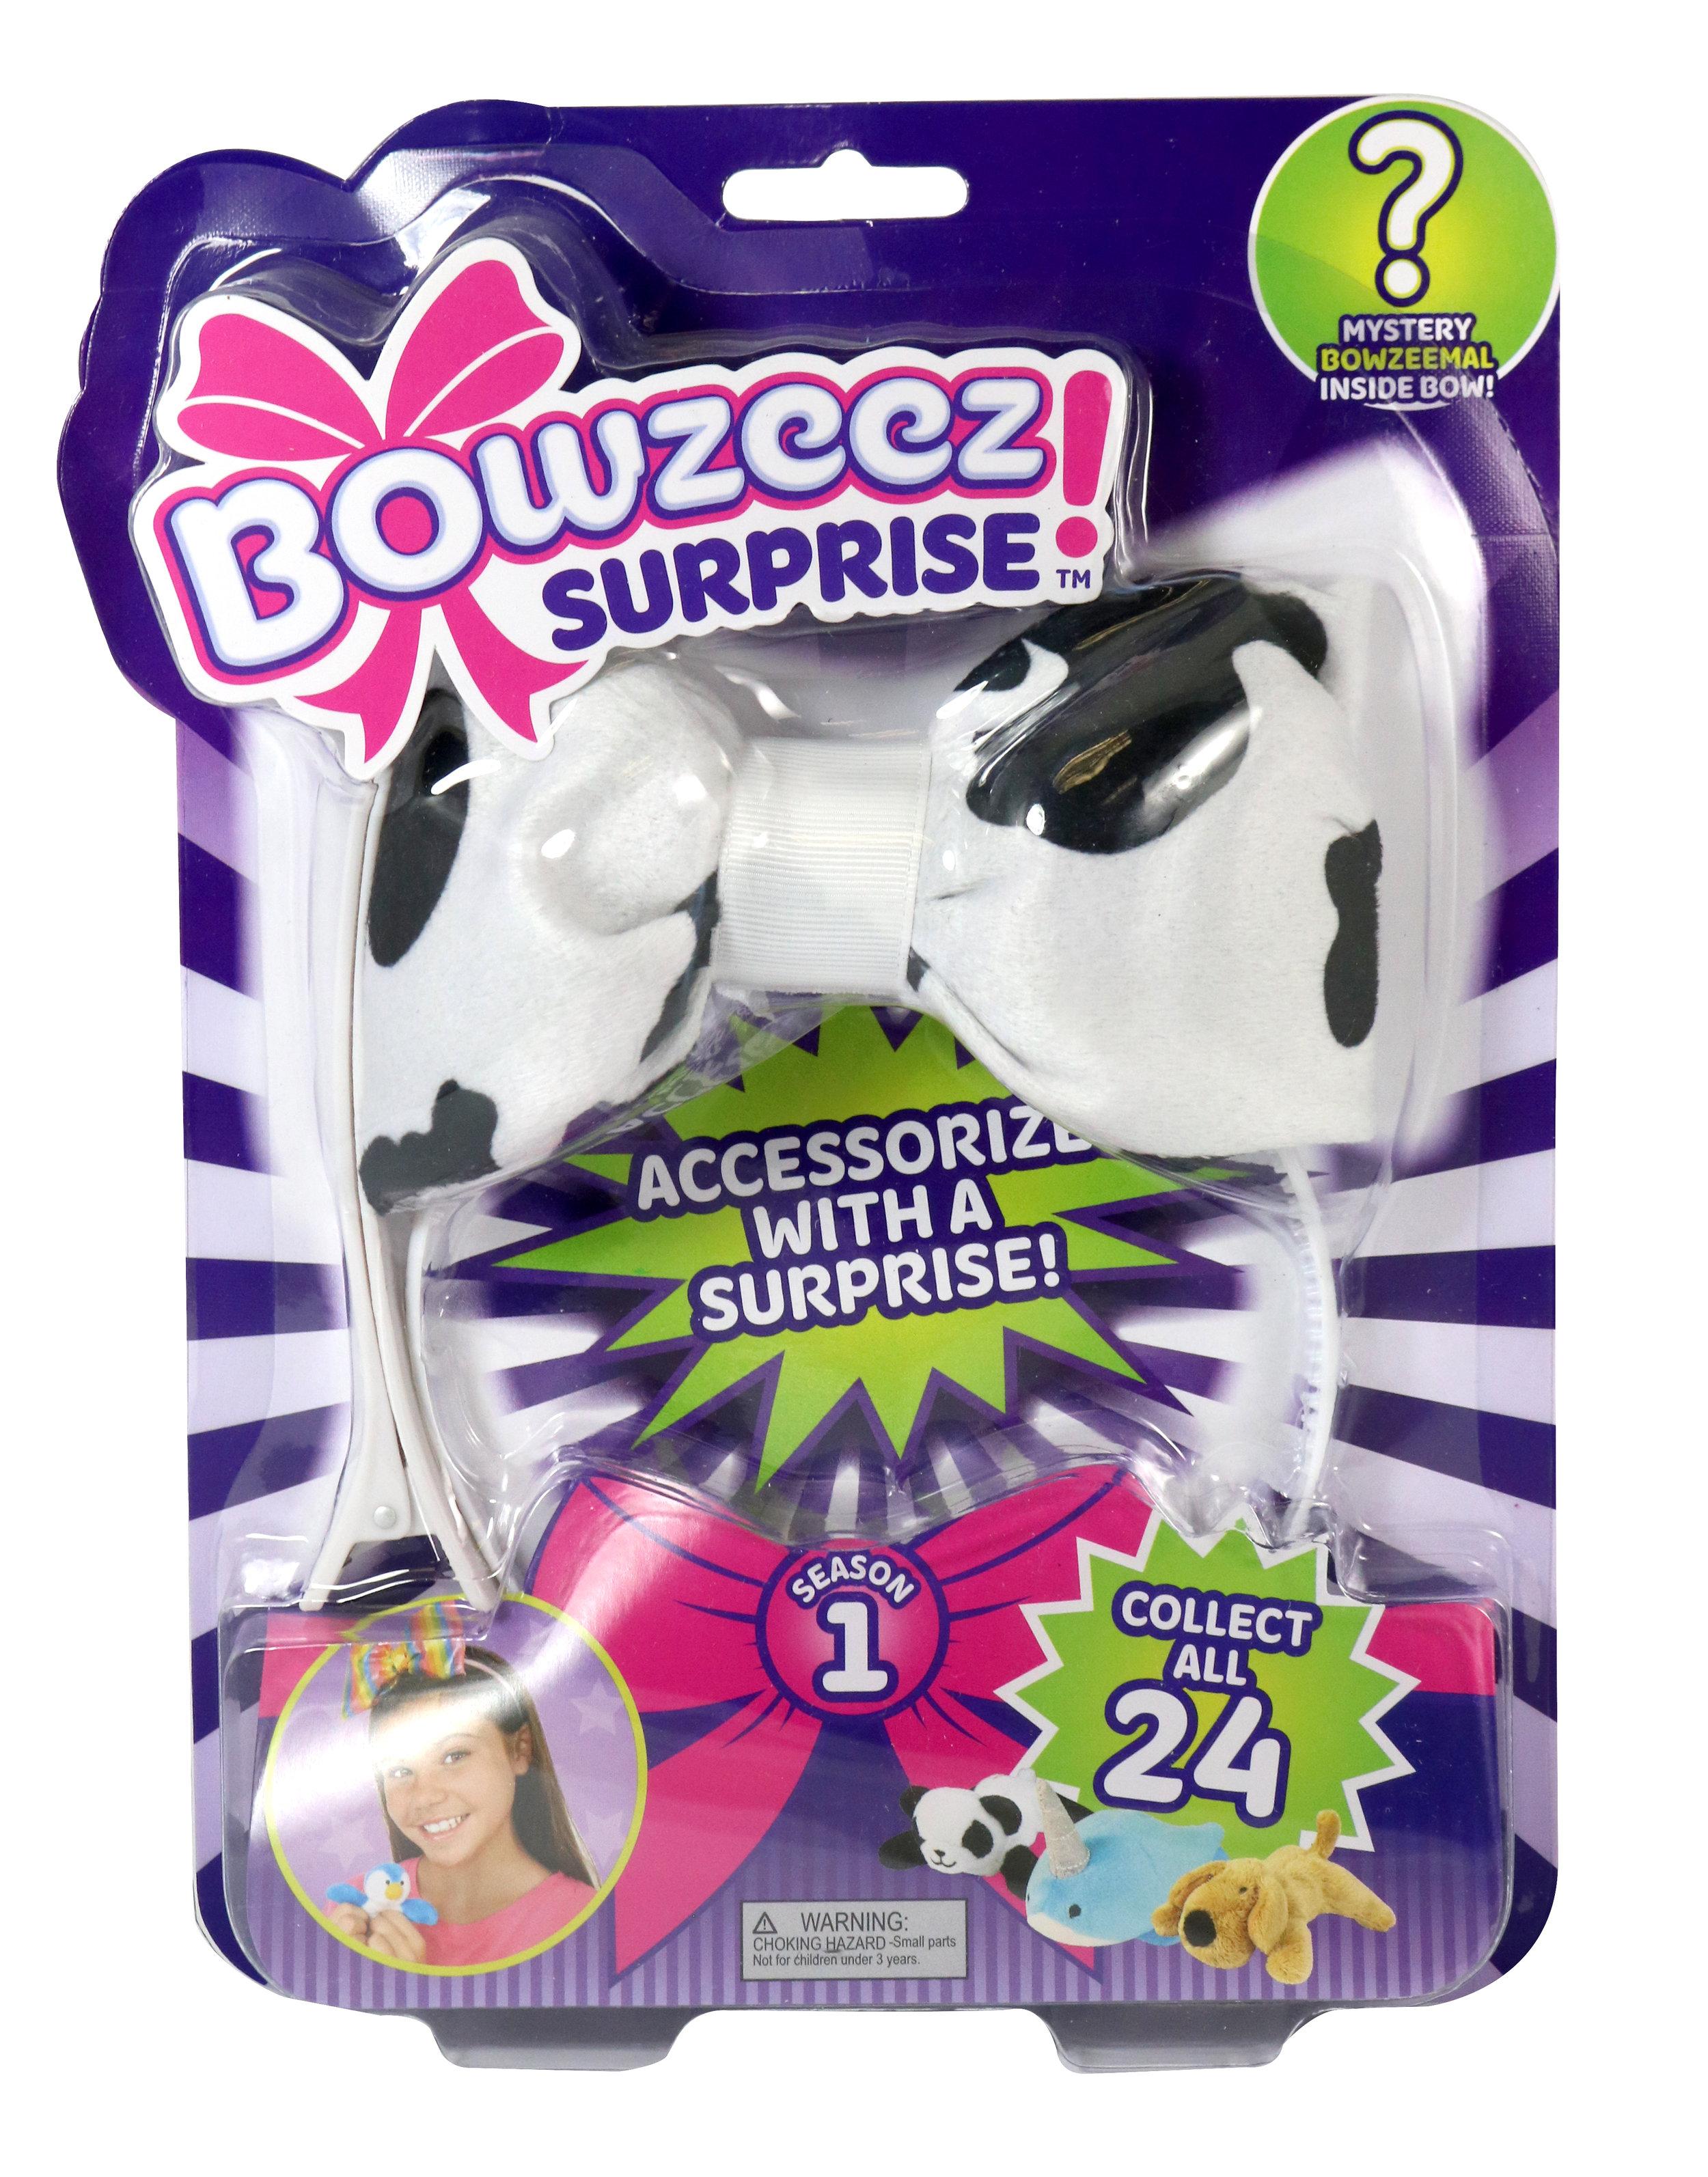 Bowzeez_Cow.jpg